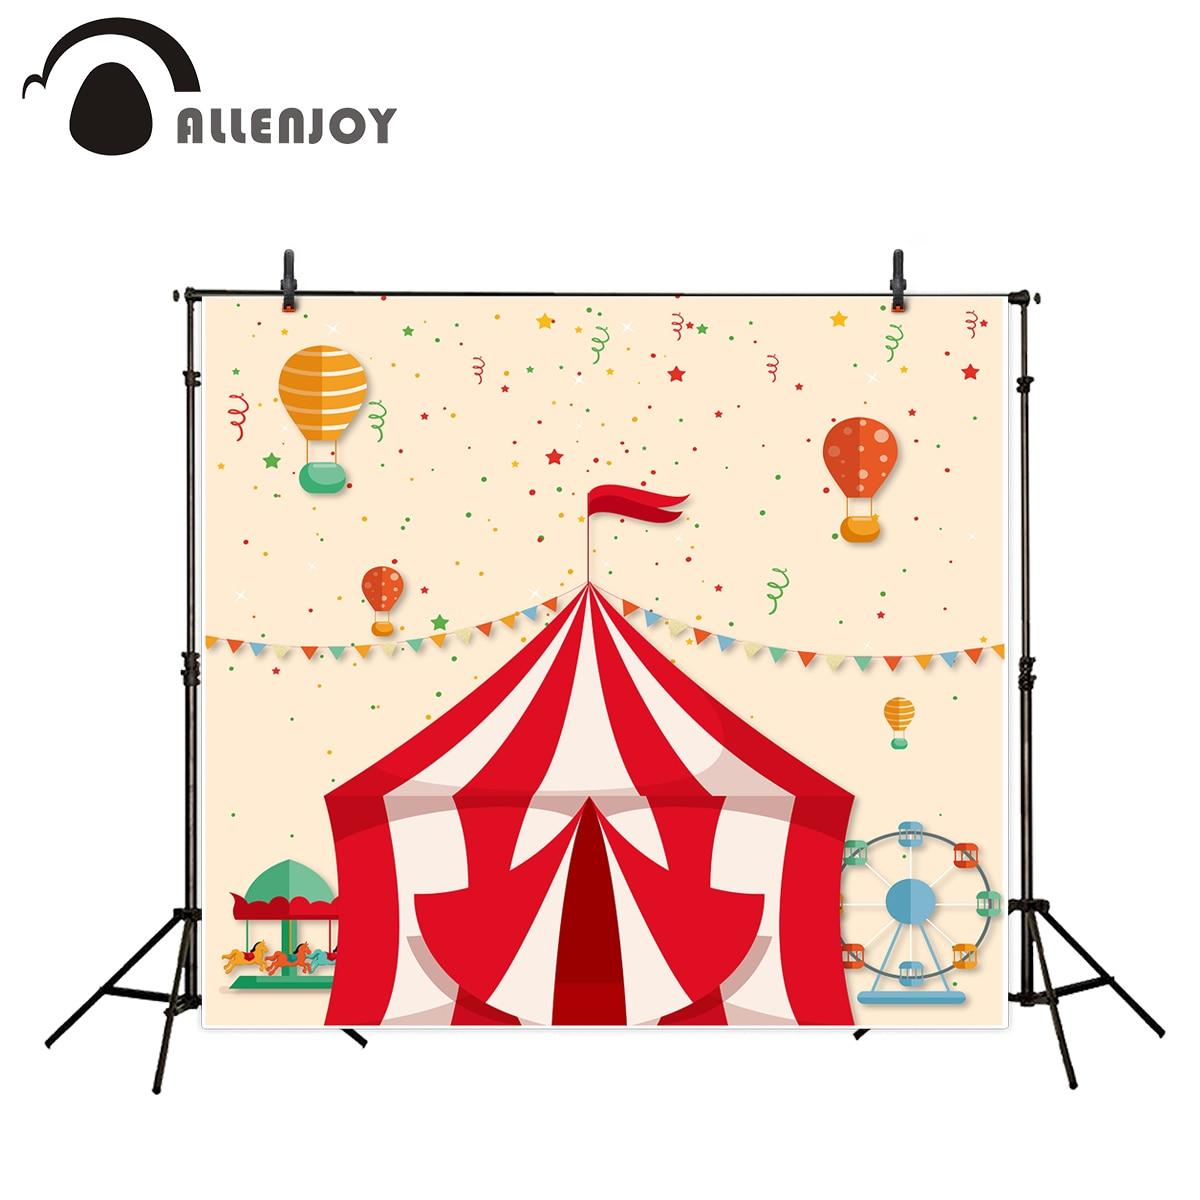 Allenjoy photography theme background amusement park Circus Carousel Balloon festival photographic camera backdrop vinyl photos 5feet 6 5feet background snow housing balloon photography backdropsvinyl photography backdrop 3447 lk